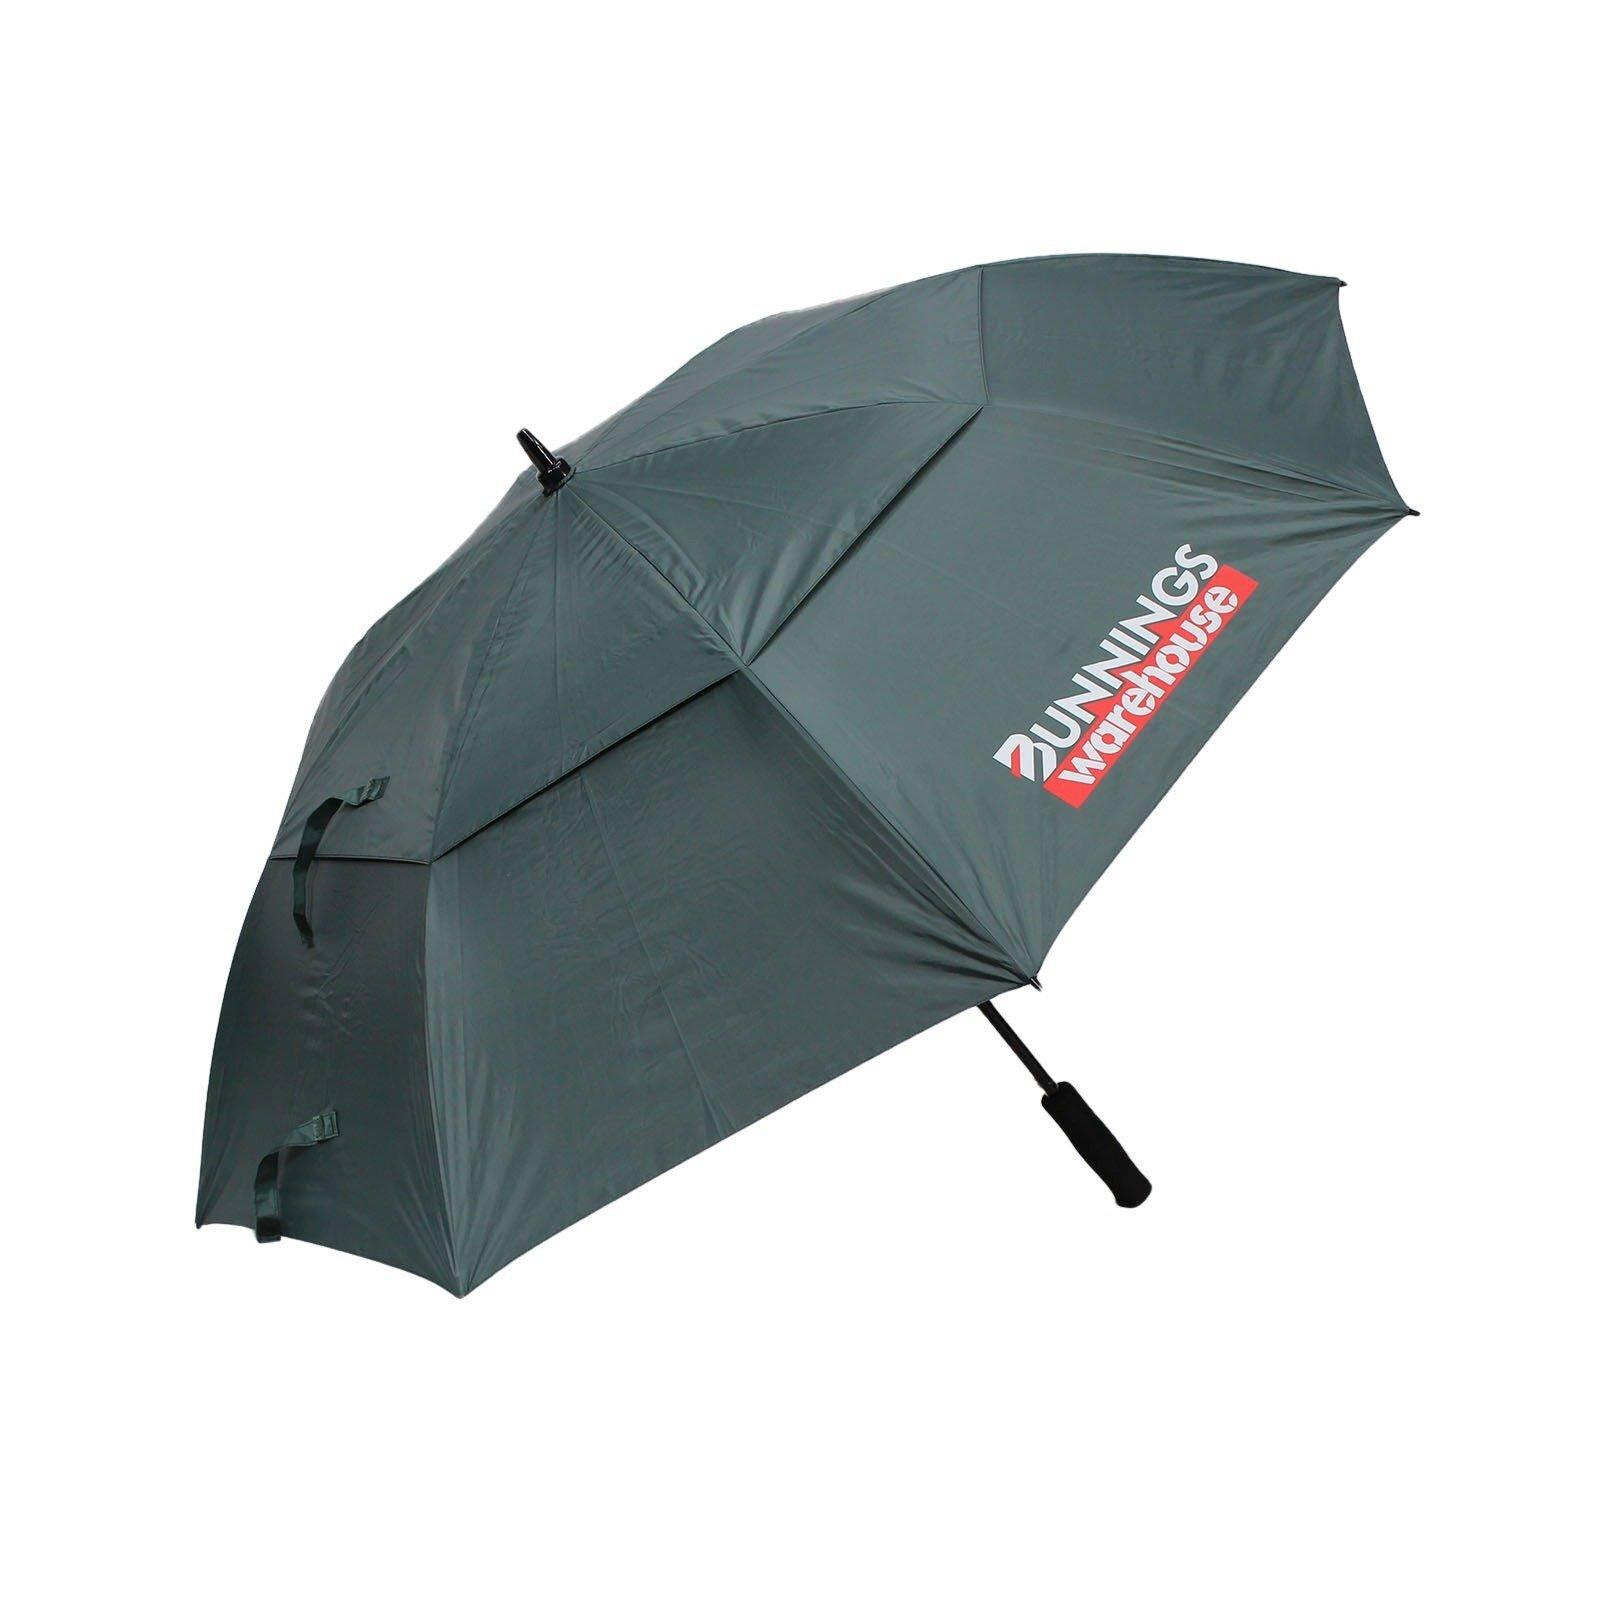 Bunnings Golf Umbrella